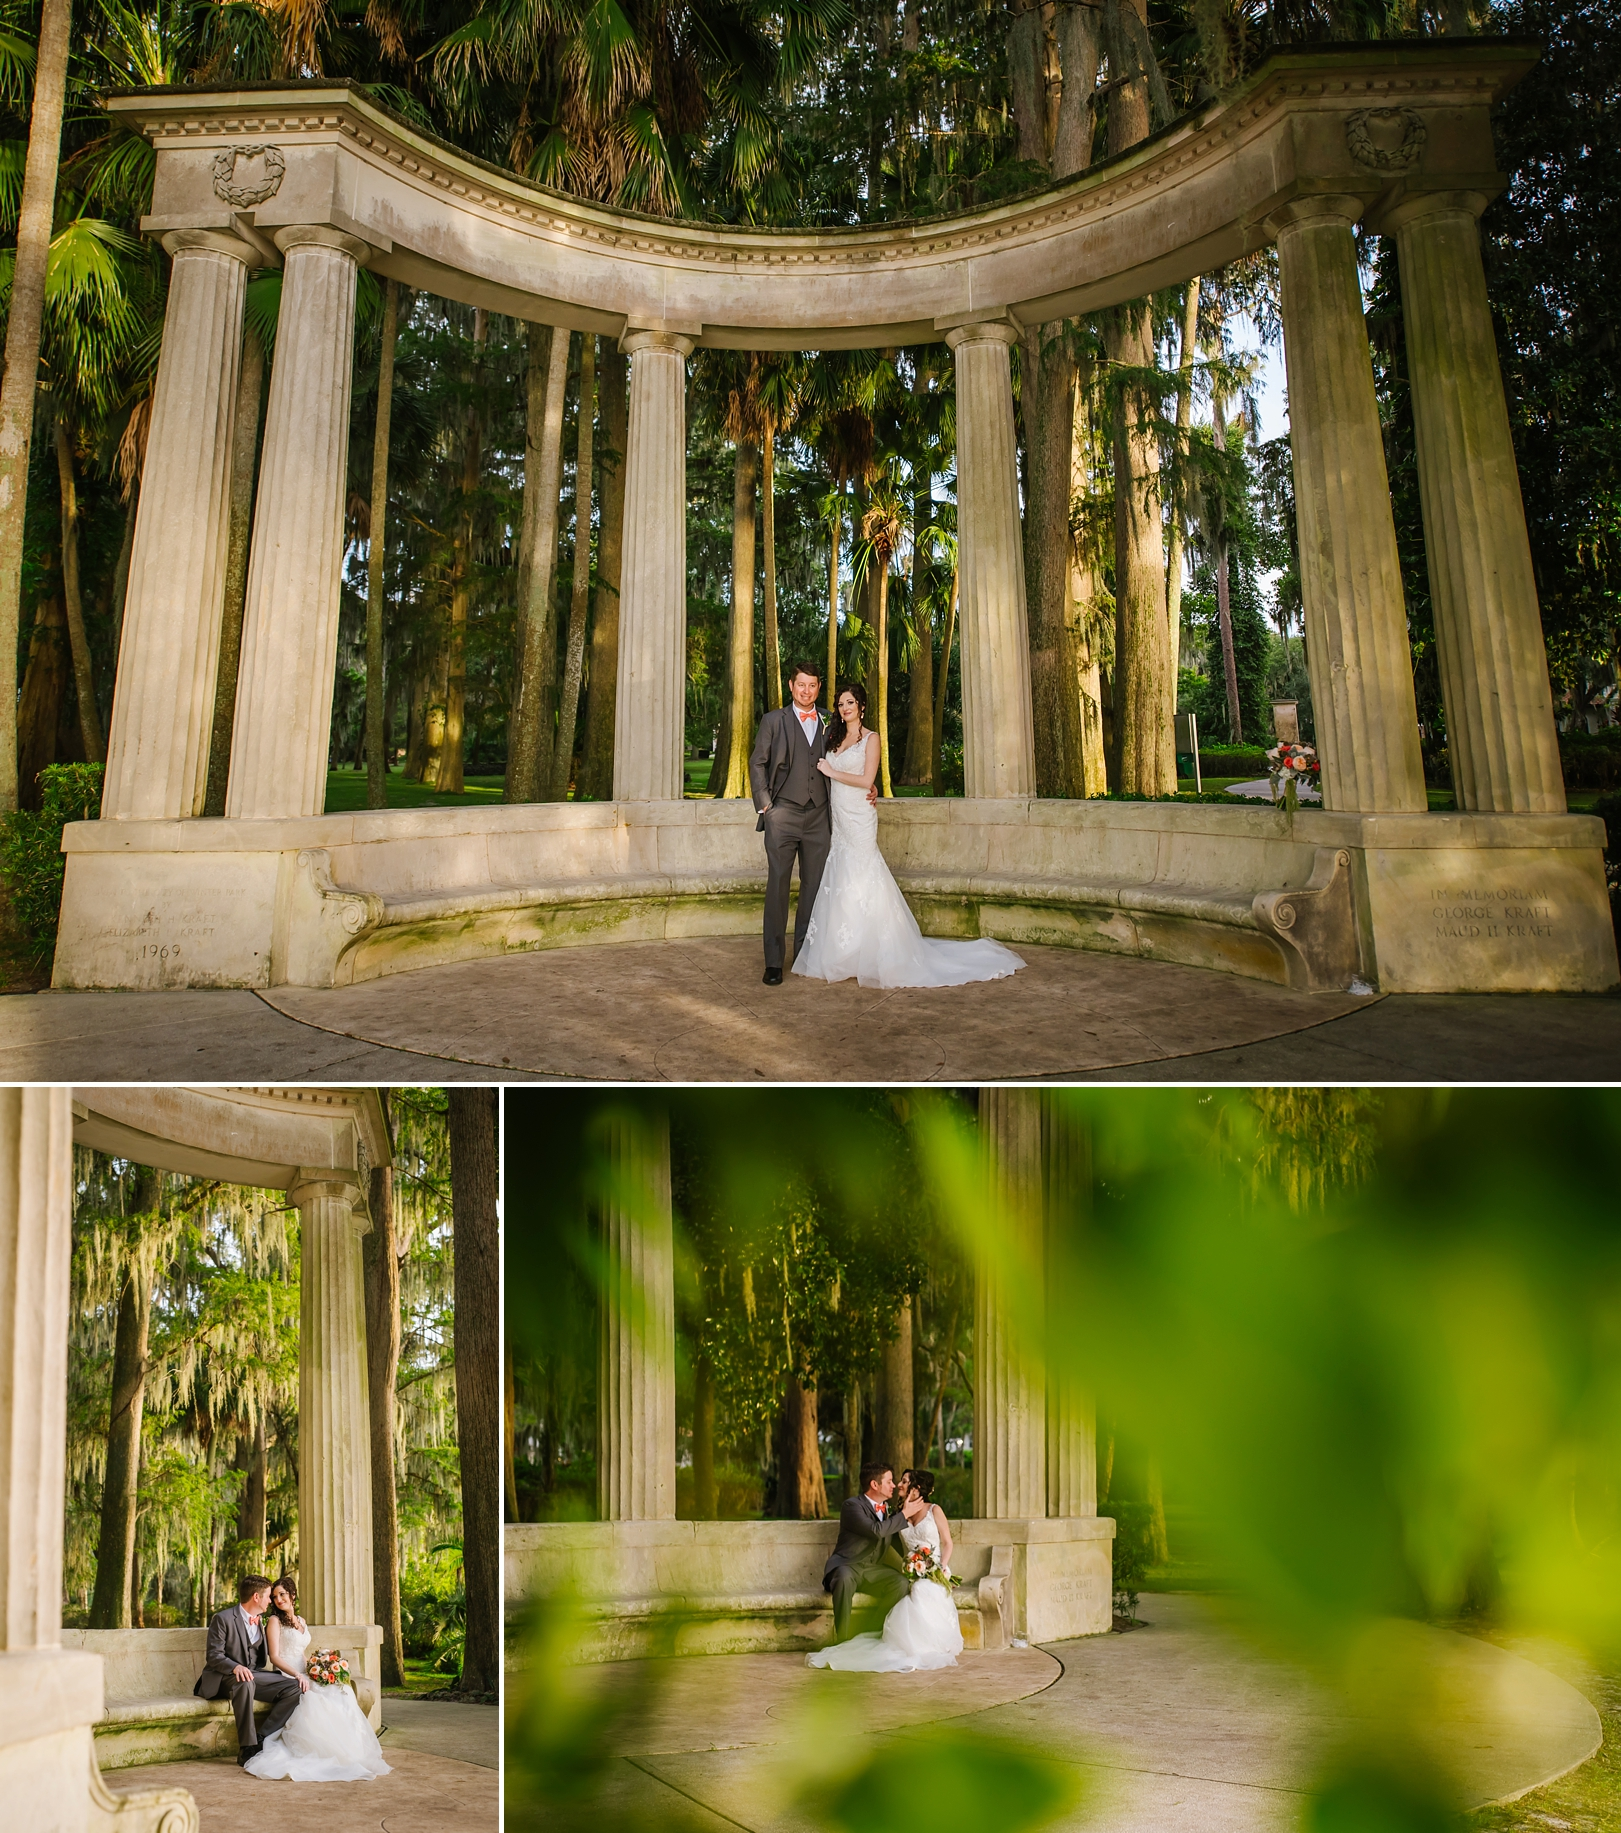 kraft-azalea-gardens-stylish-elopment-wedding-photography_0021.jpg